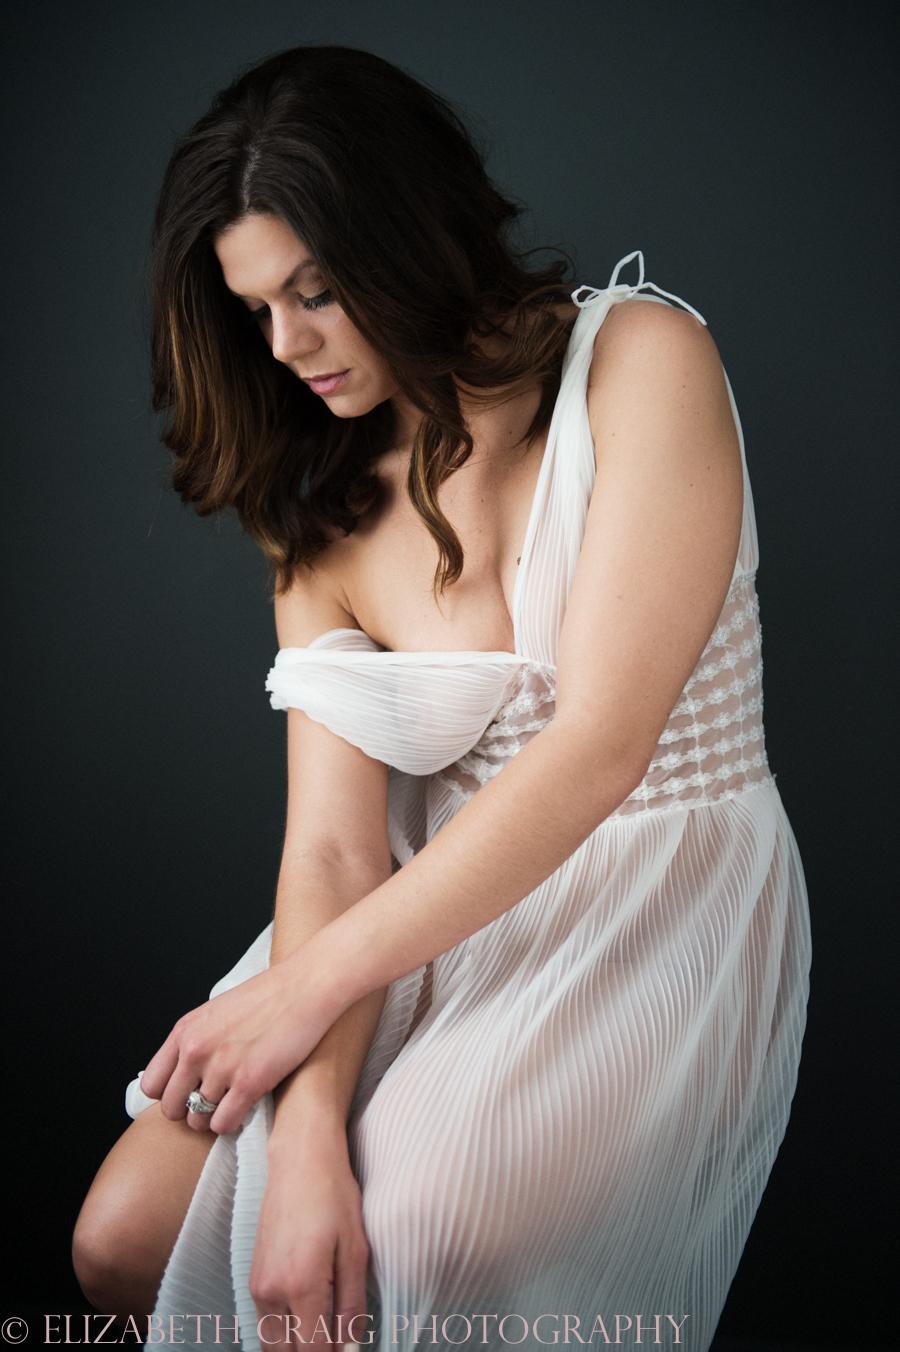 elizabeth-craig-boudoir-photography-6